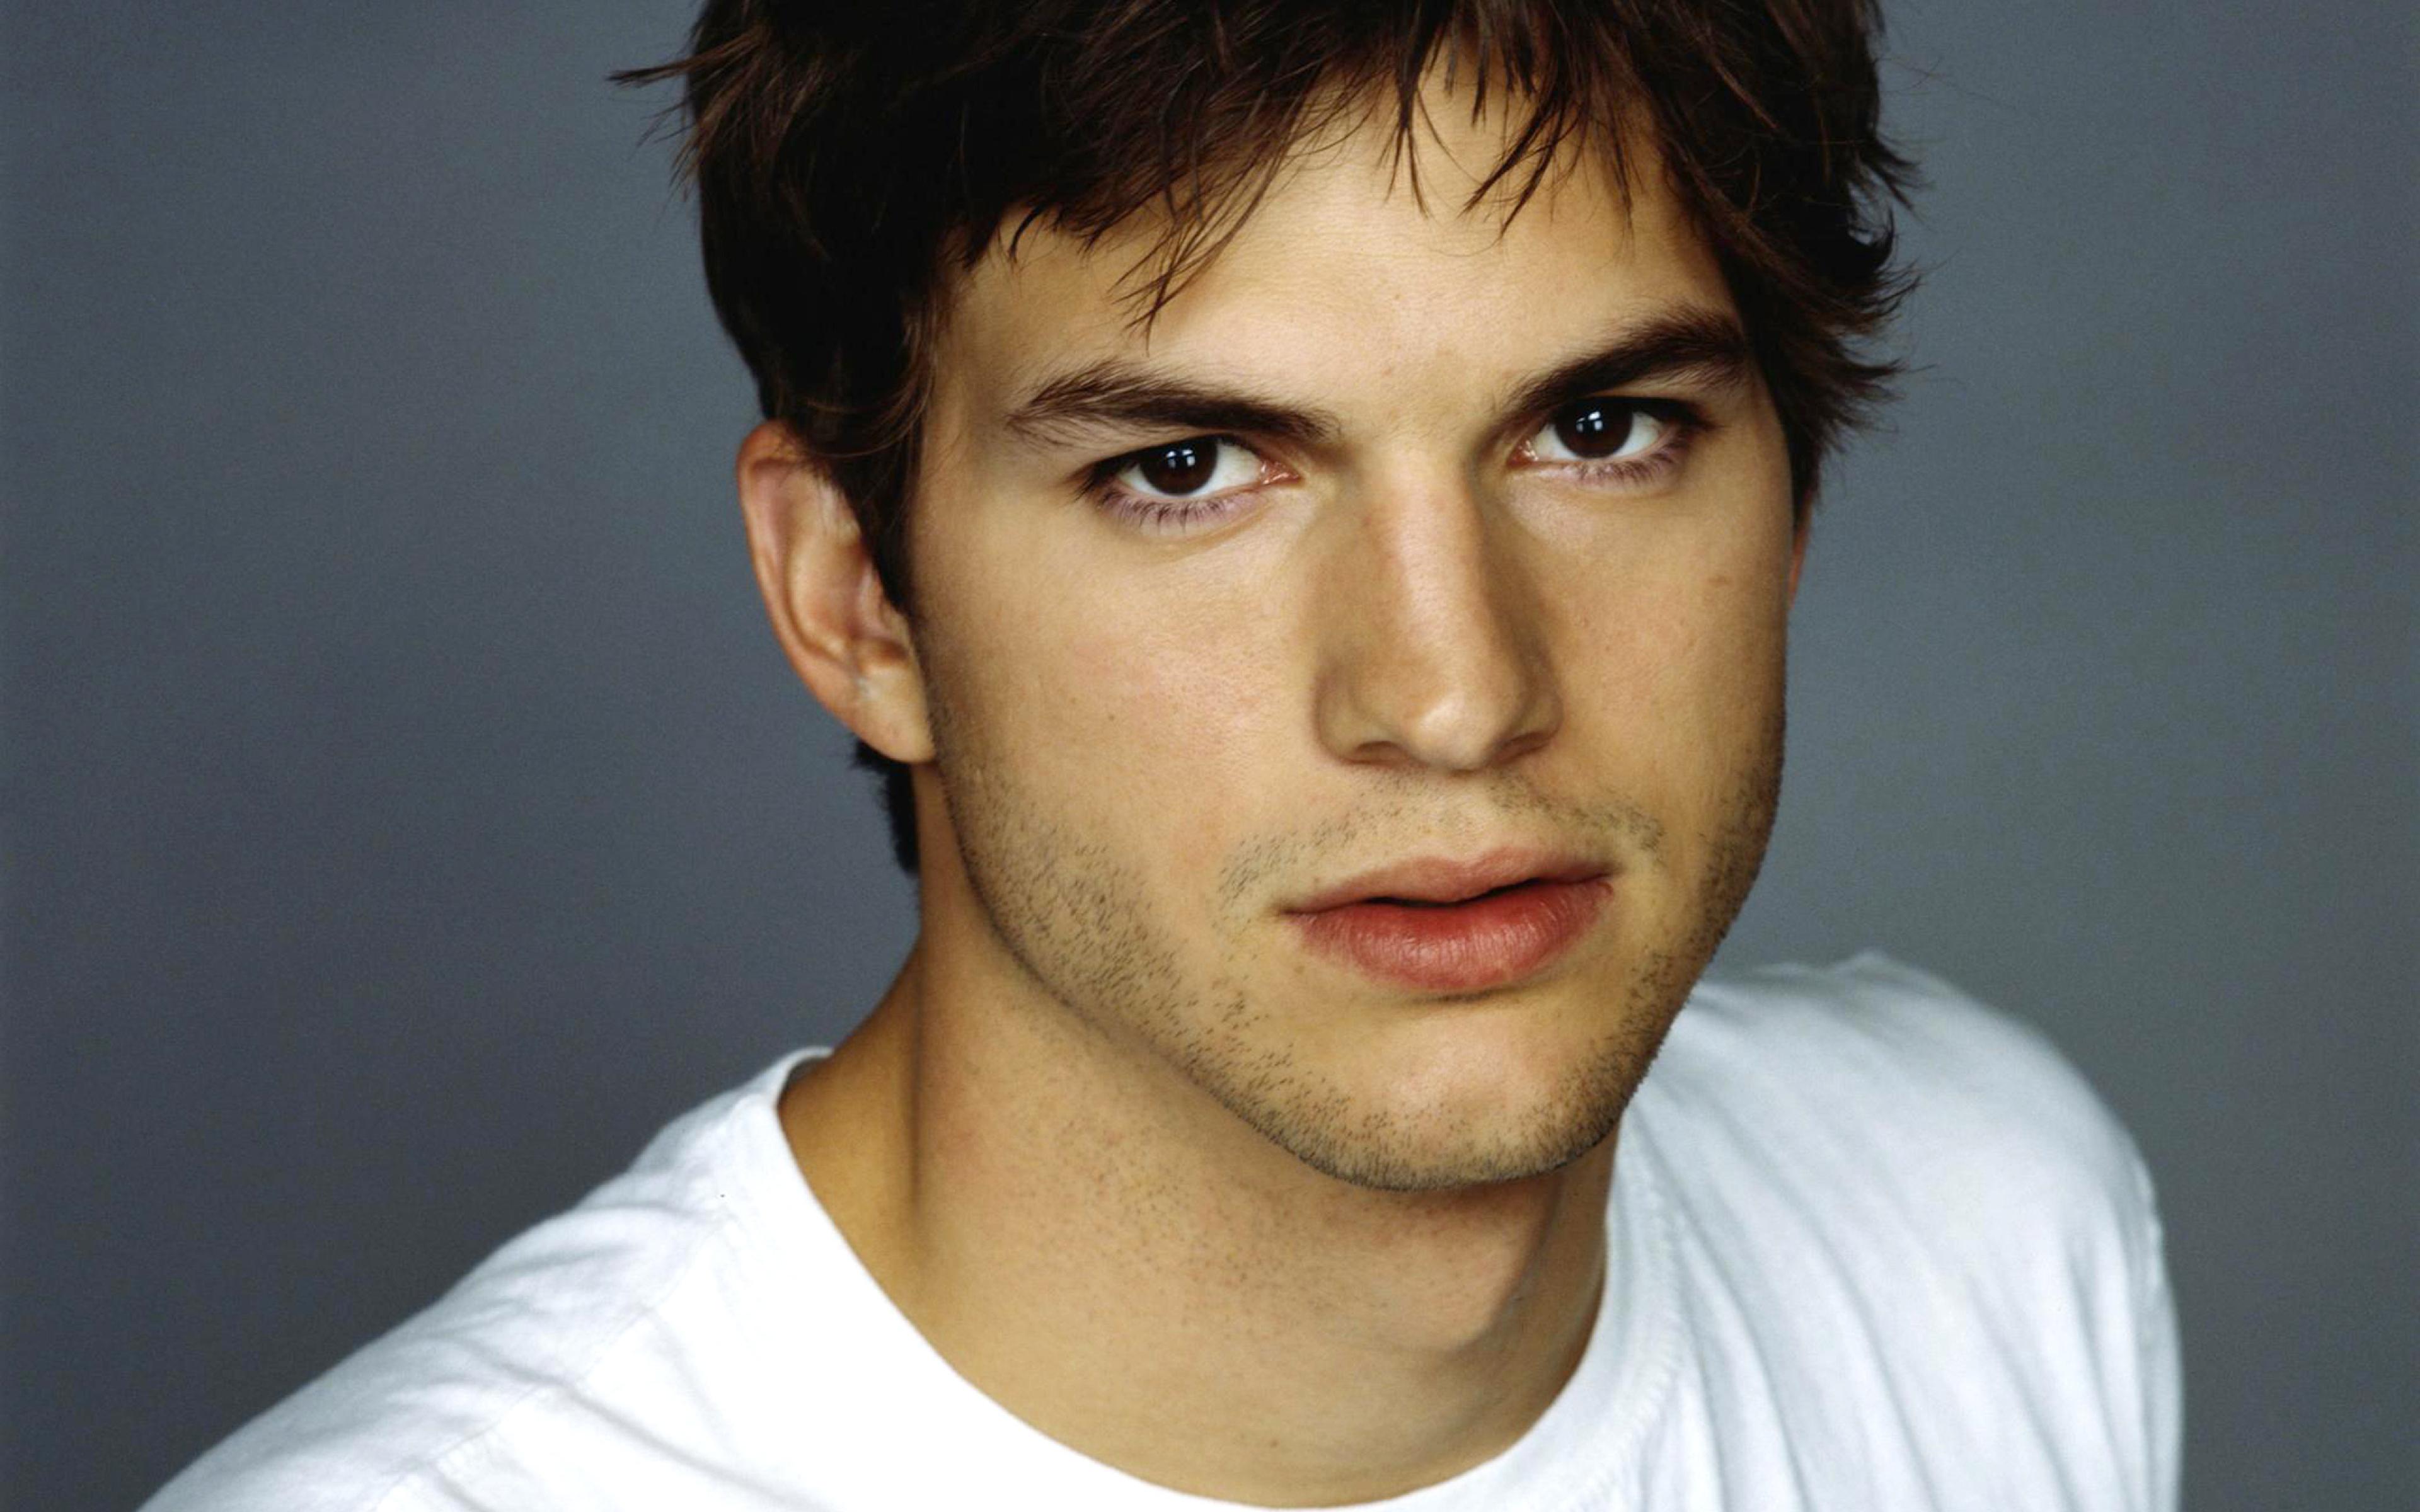 Ashton kutcher fotos de infidelidad 87